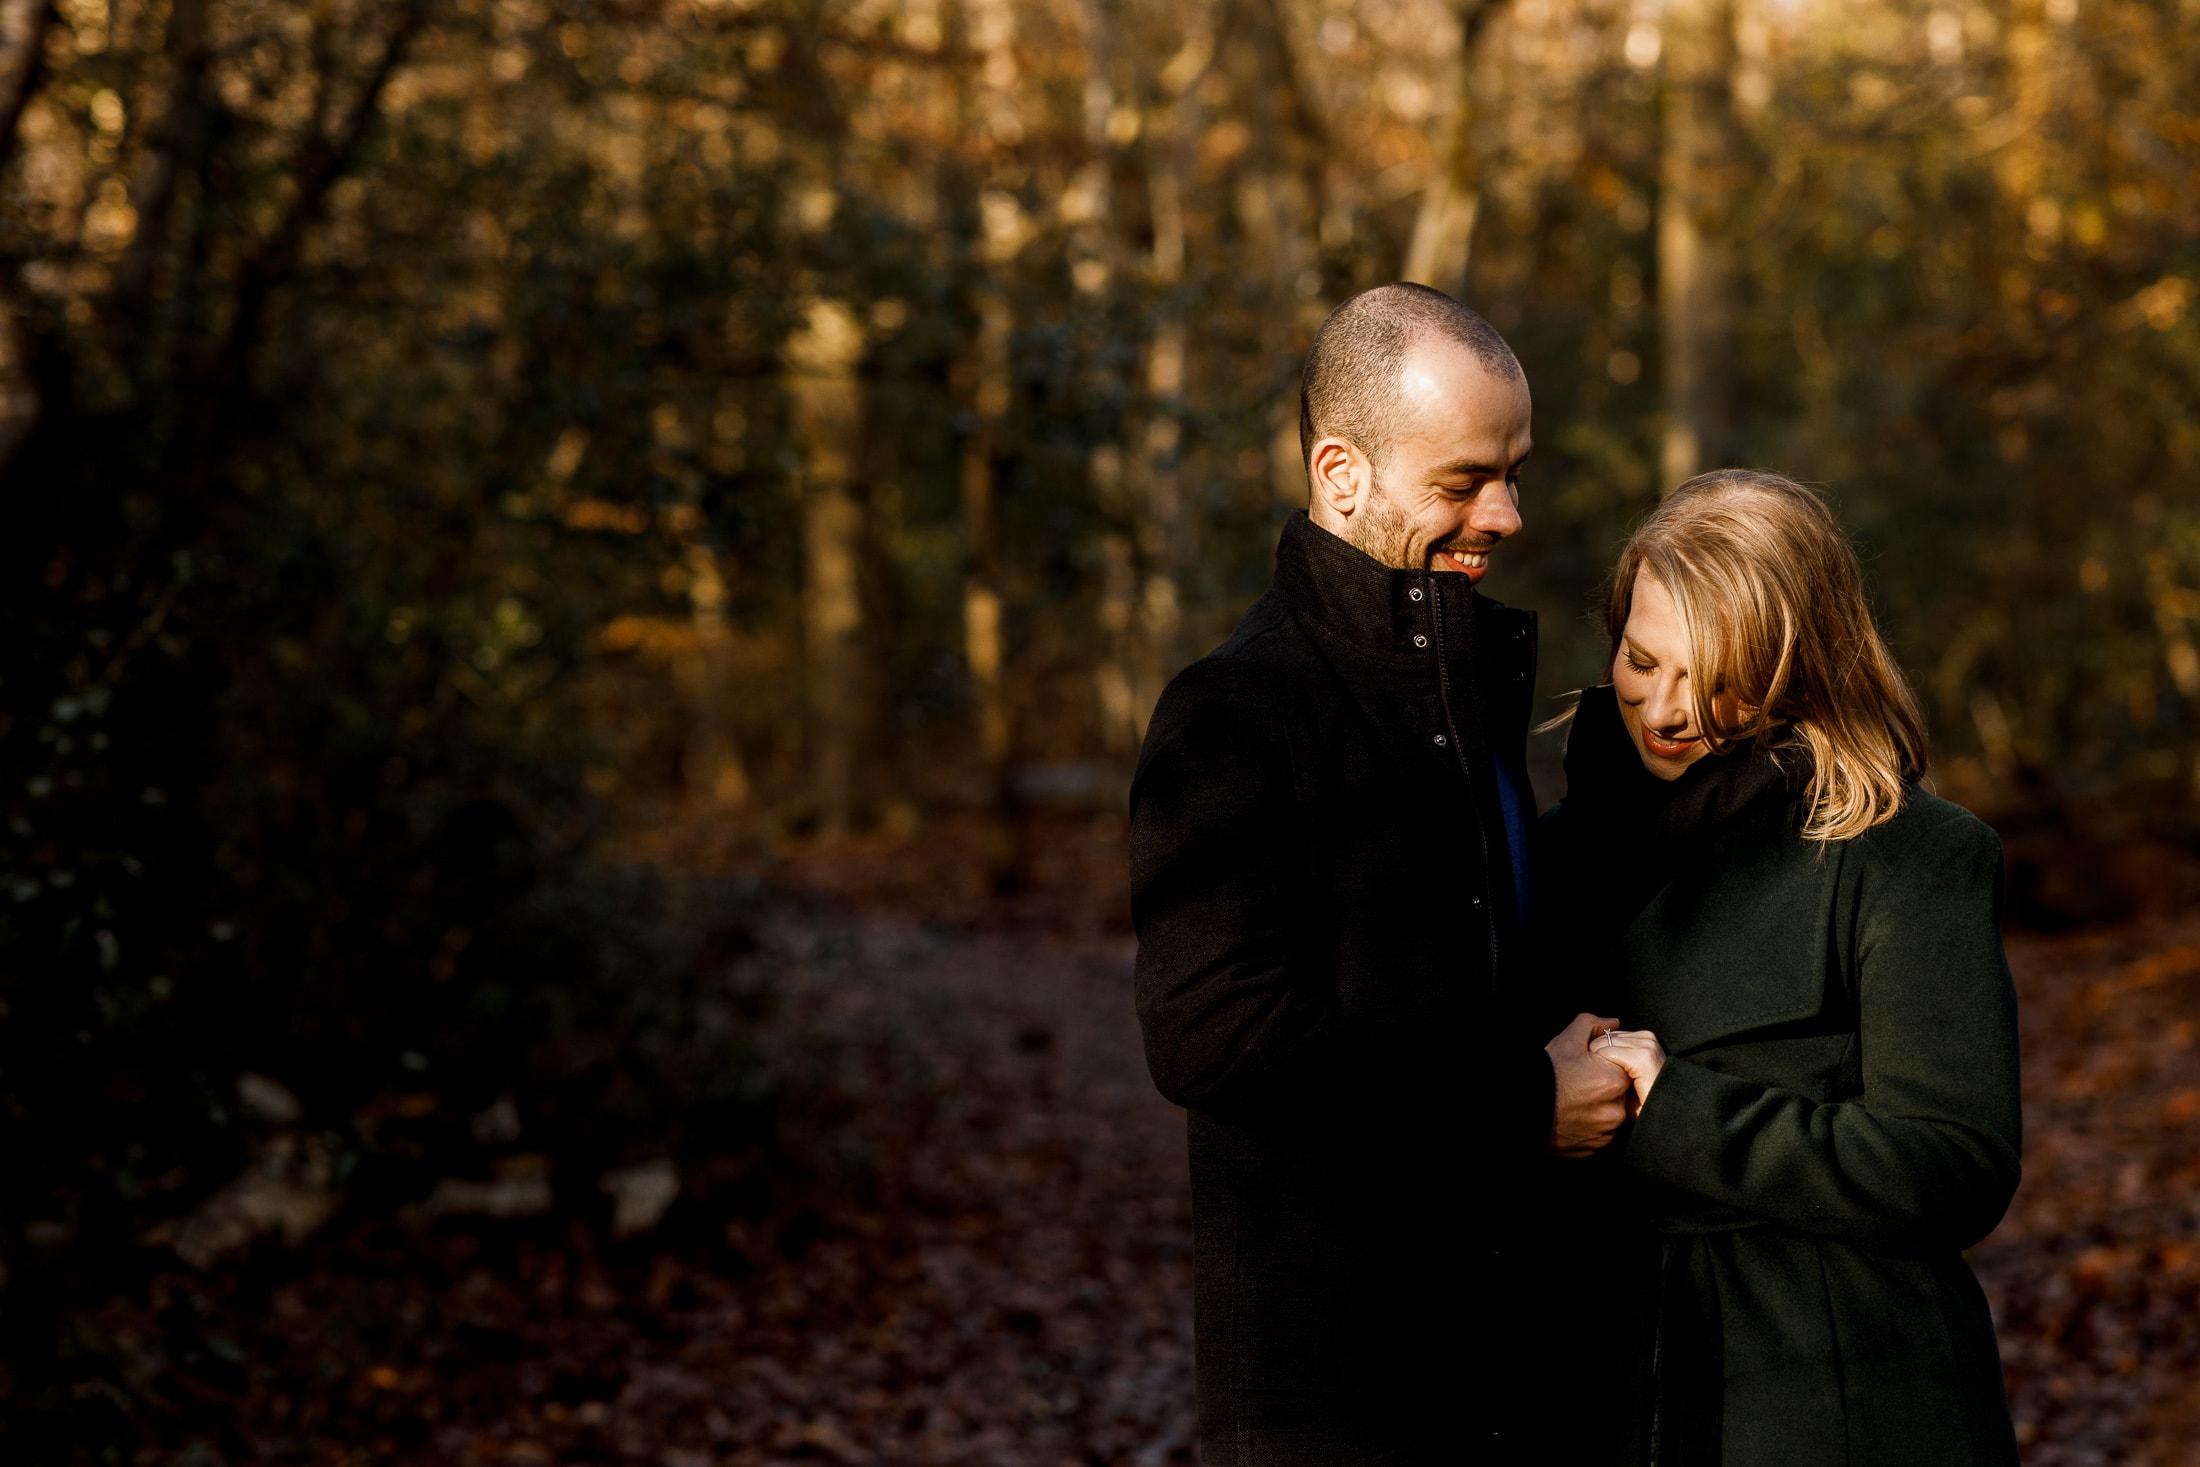 pre-wedding photographer in buckinghamshire